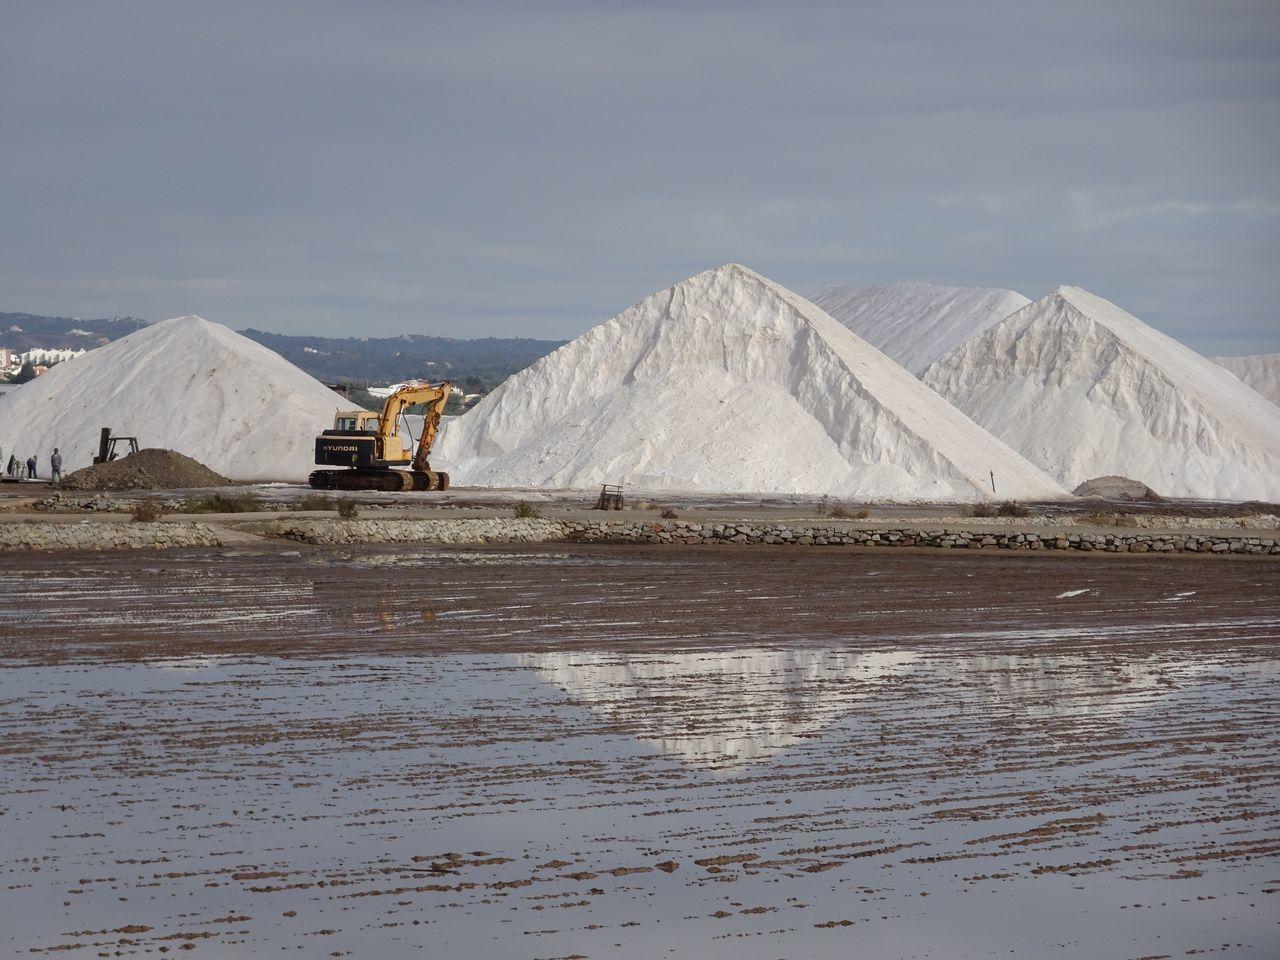 Mining Salt Basin Salt - Mineral Nature Heap Salt Flat No People Sky Day Outdoors Coal Mine Beauty In Nature